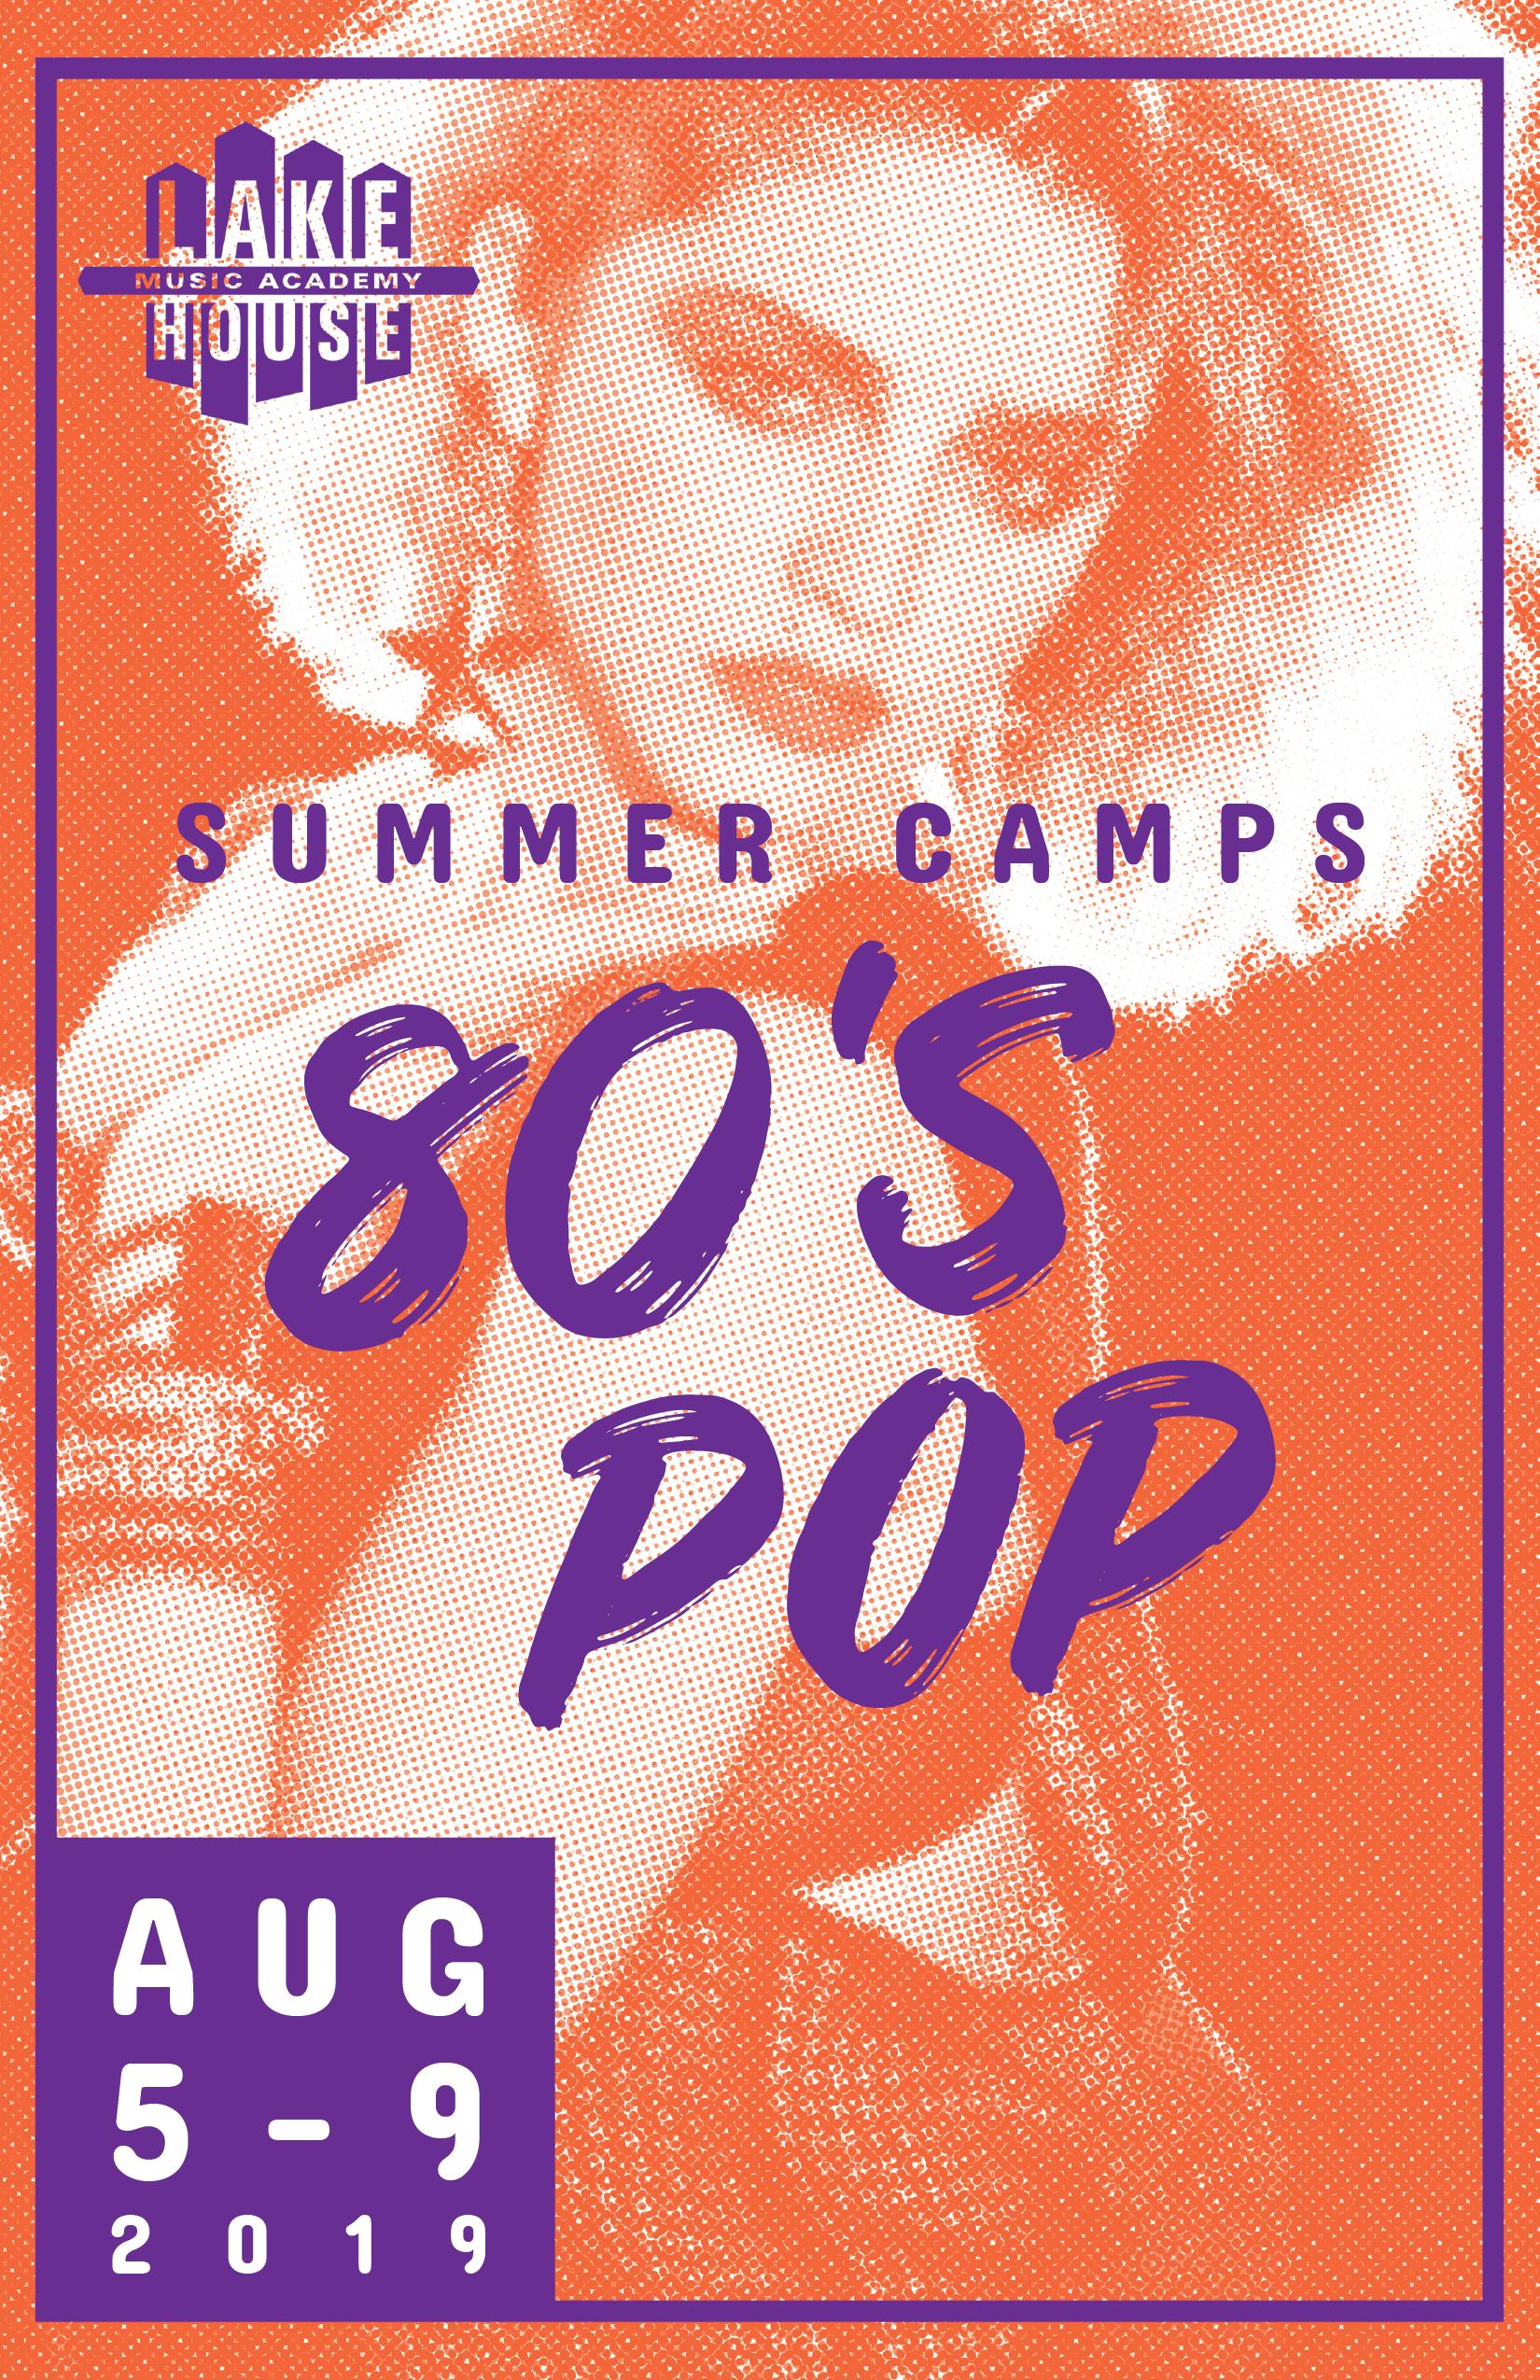 80's pop - August 5 - 9